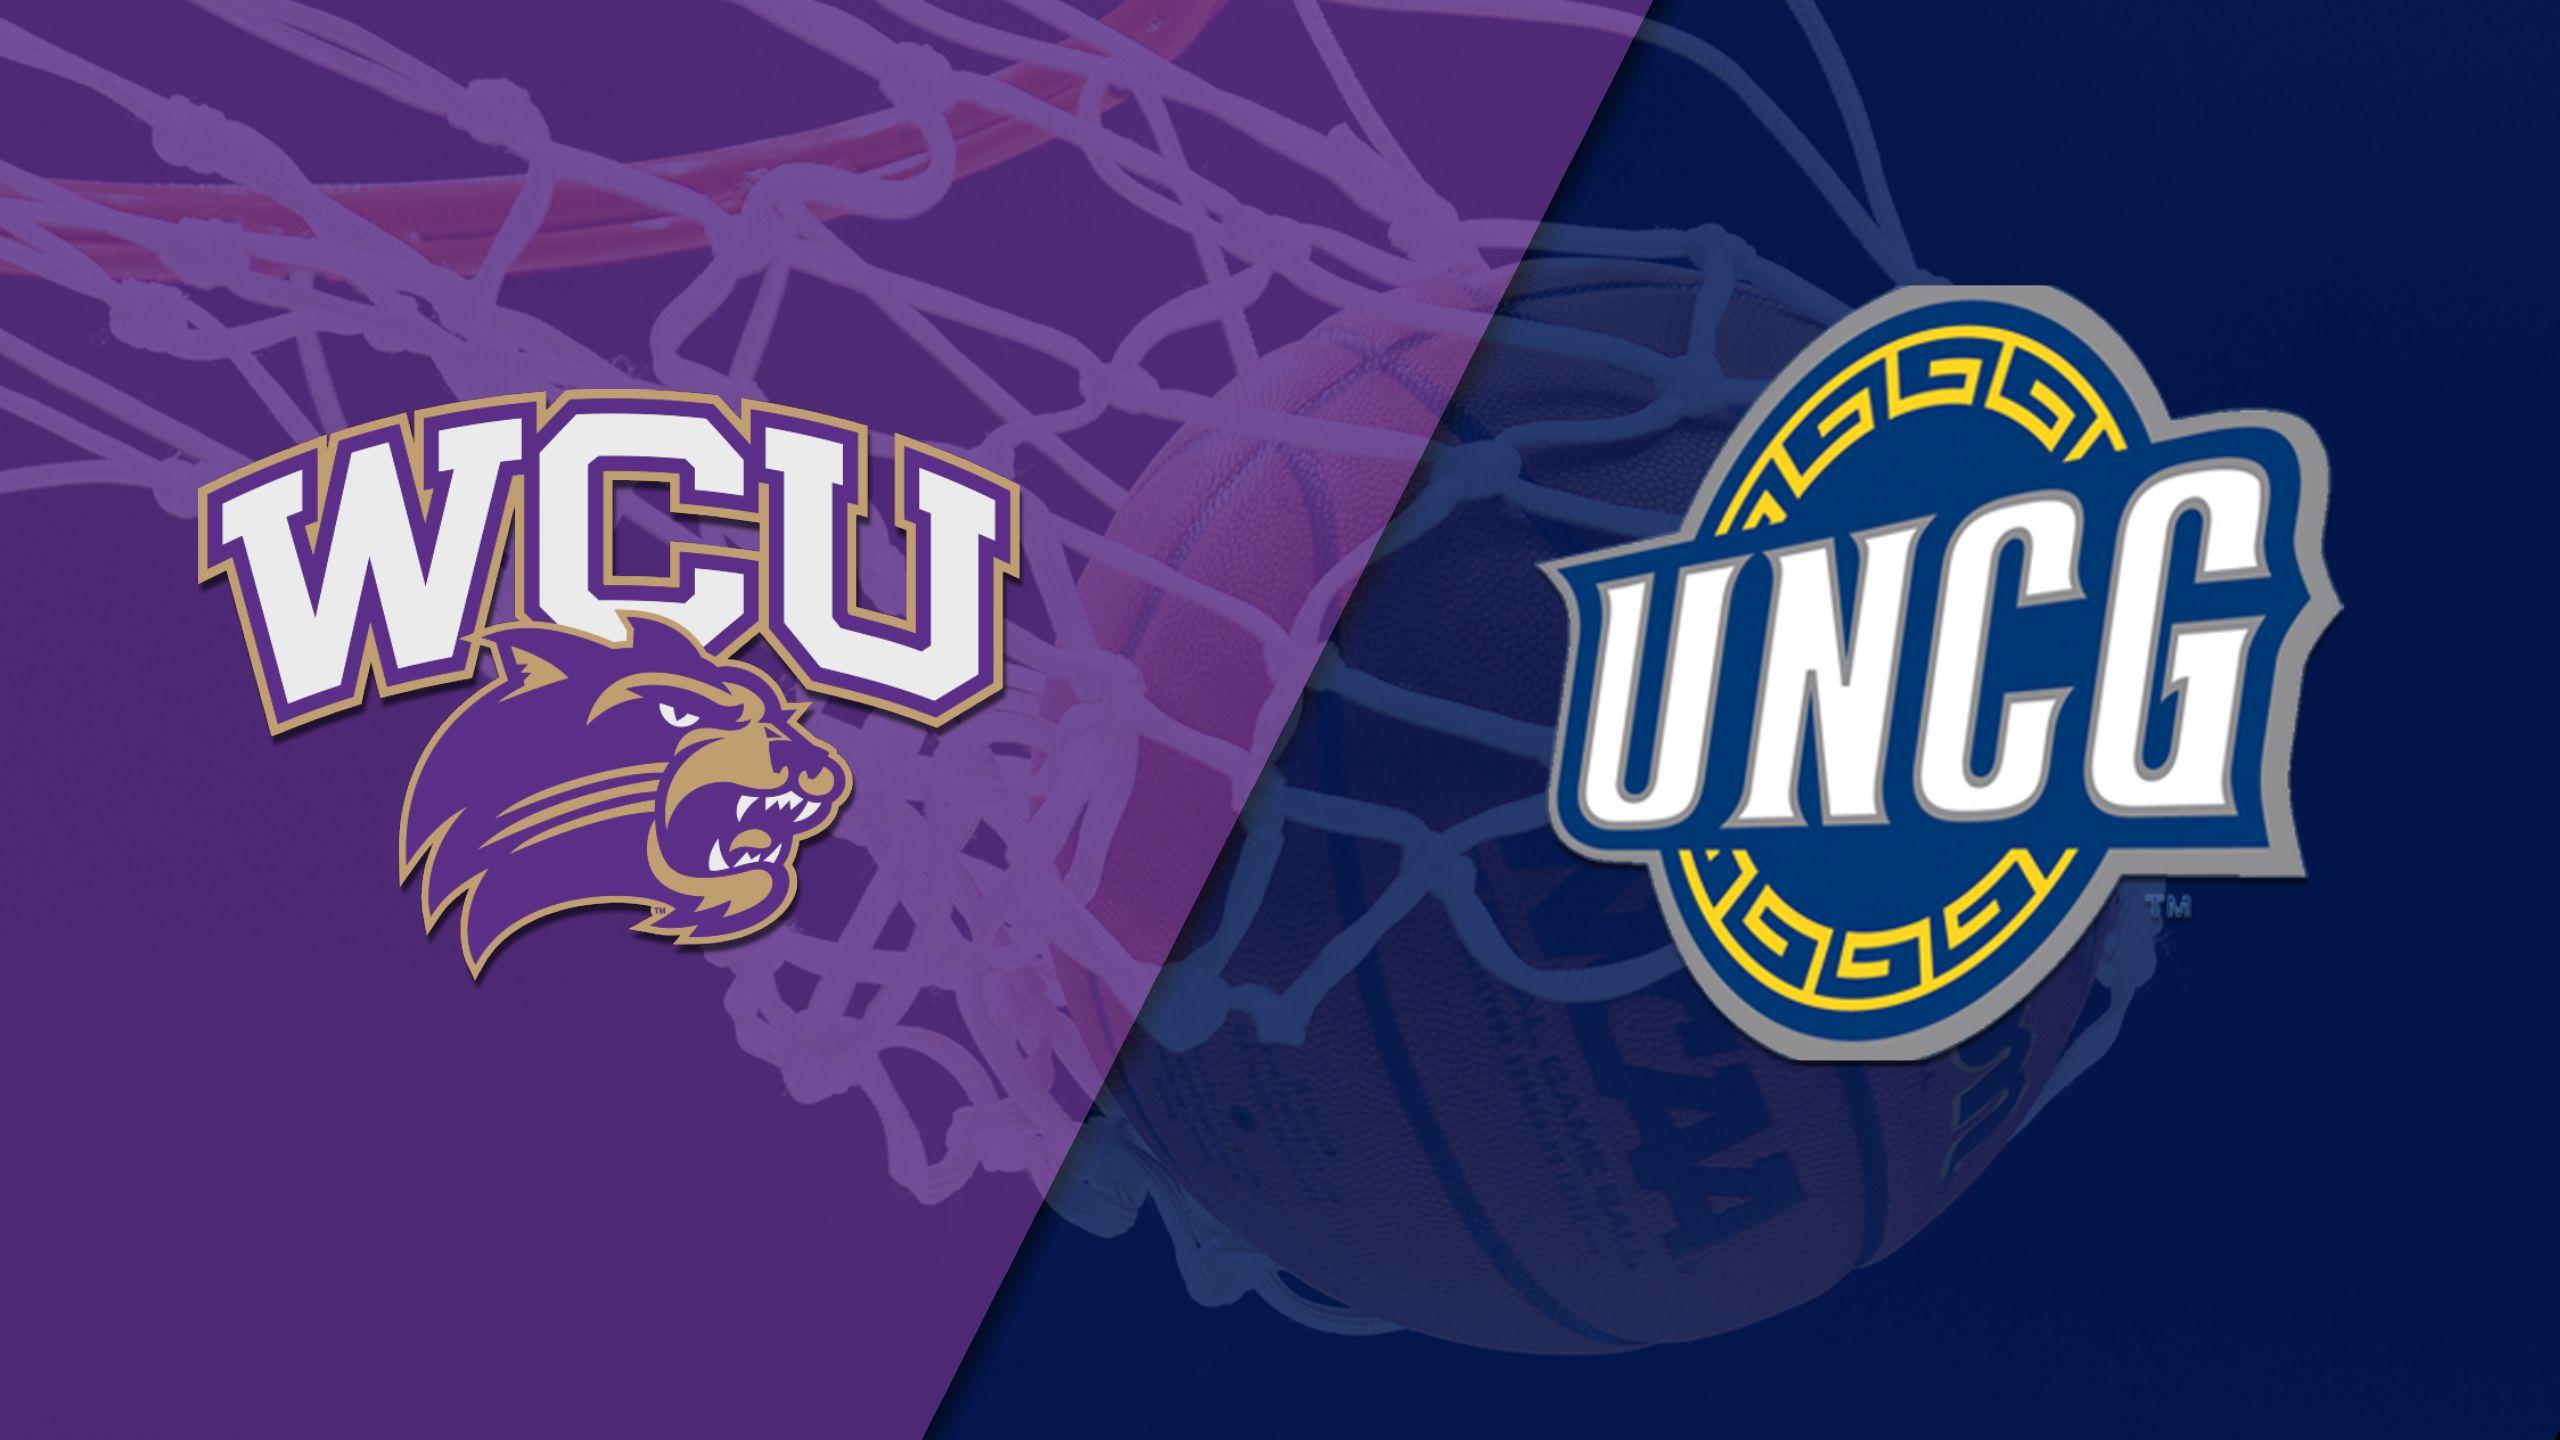 Western Carolina vs. UNC Greensboro (M Basketball)